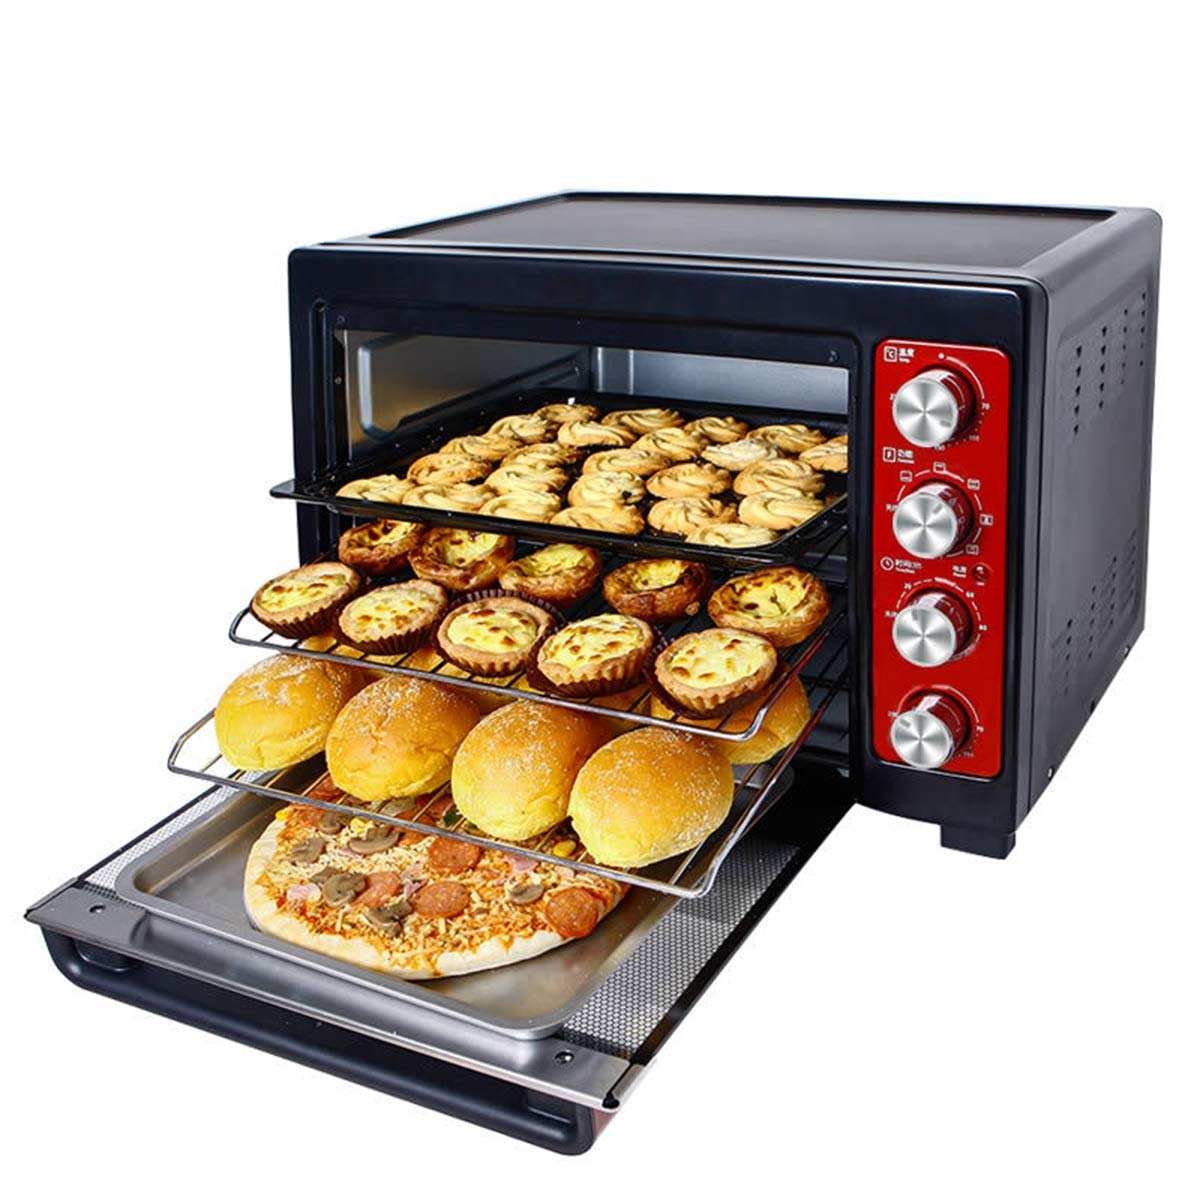 THOR-YAN ミニオーブン - ミニオーブン38 L家庭用電気オーブン多機能ベーキング上下独立温度制御オーブン -46 オーブン   B07NWYR6TH